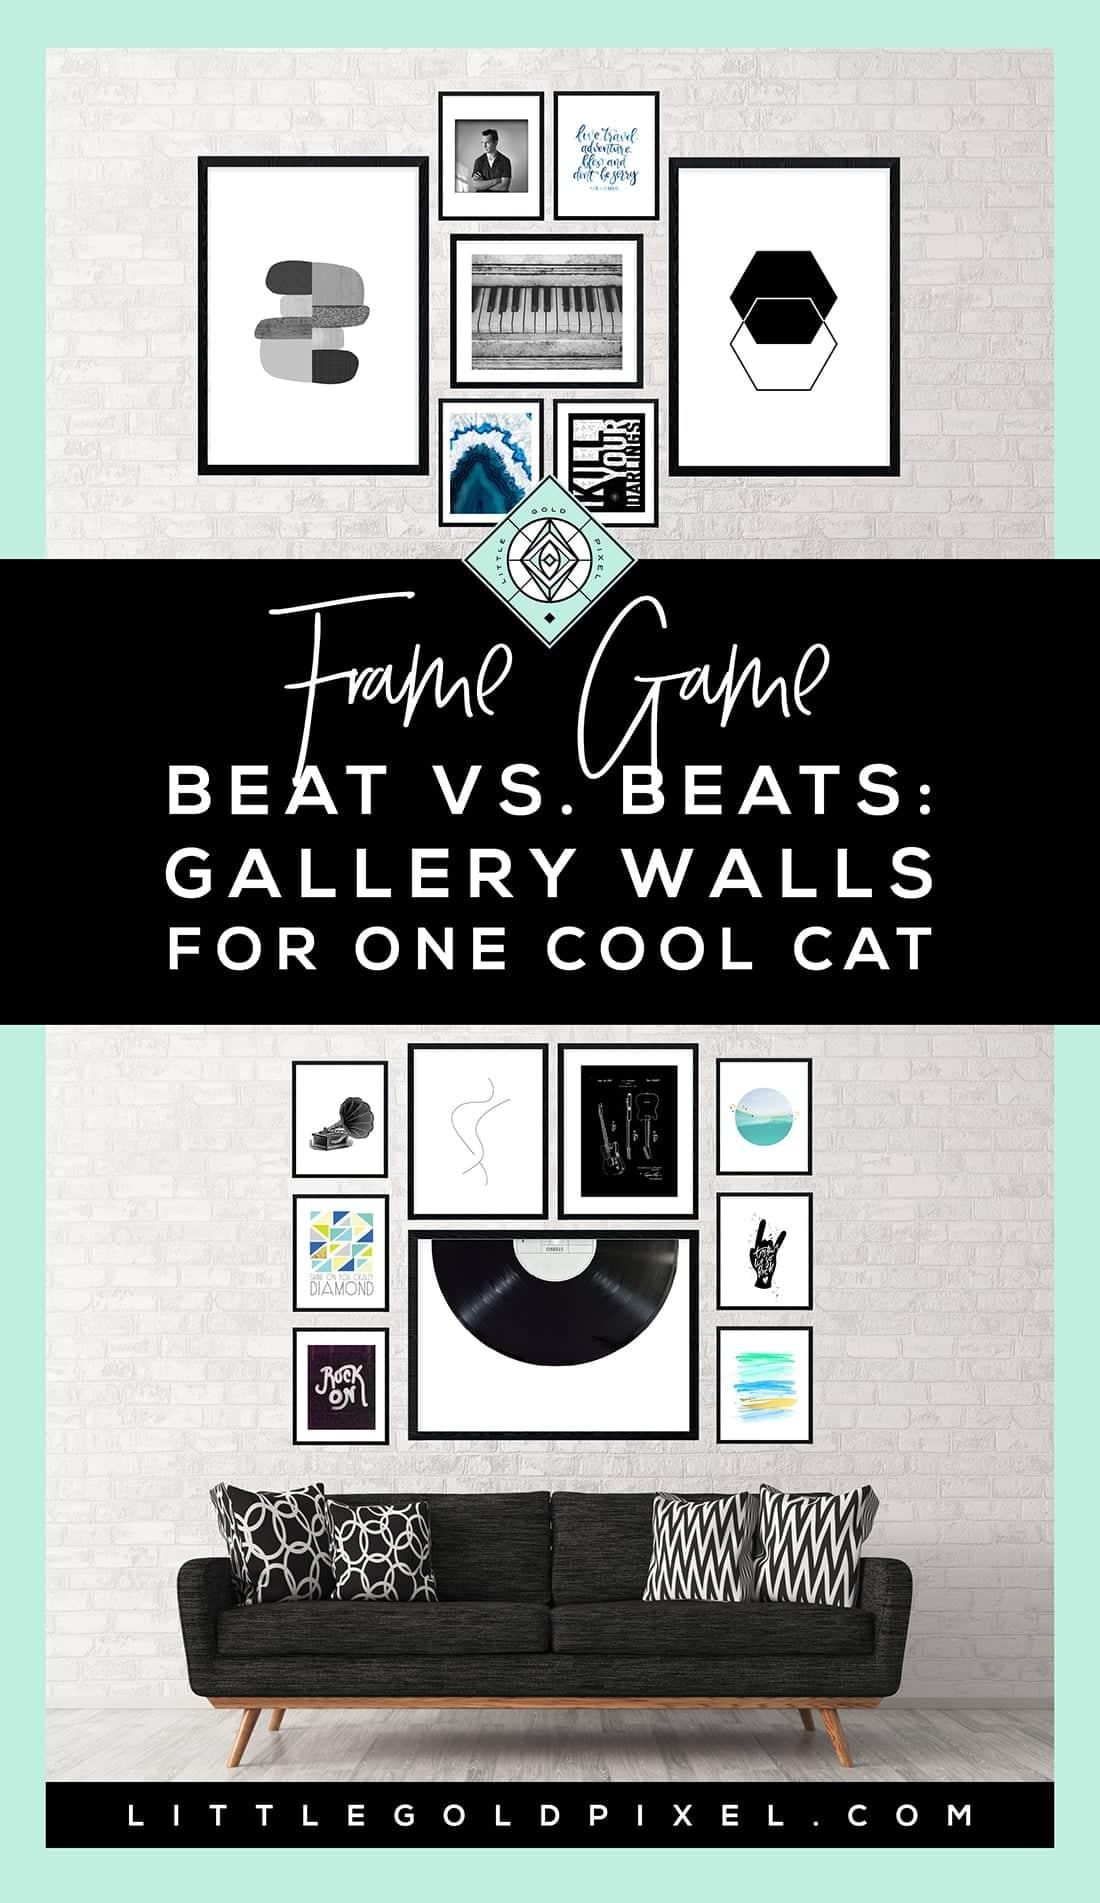 Vintage Frame Game u Hip Rocker Gallery Walls for One Cool Cat u Frame Game is an